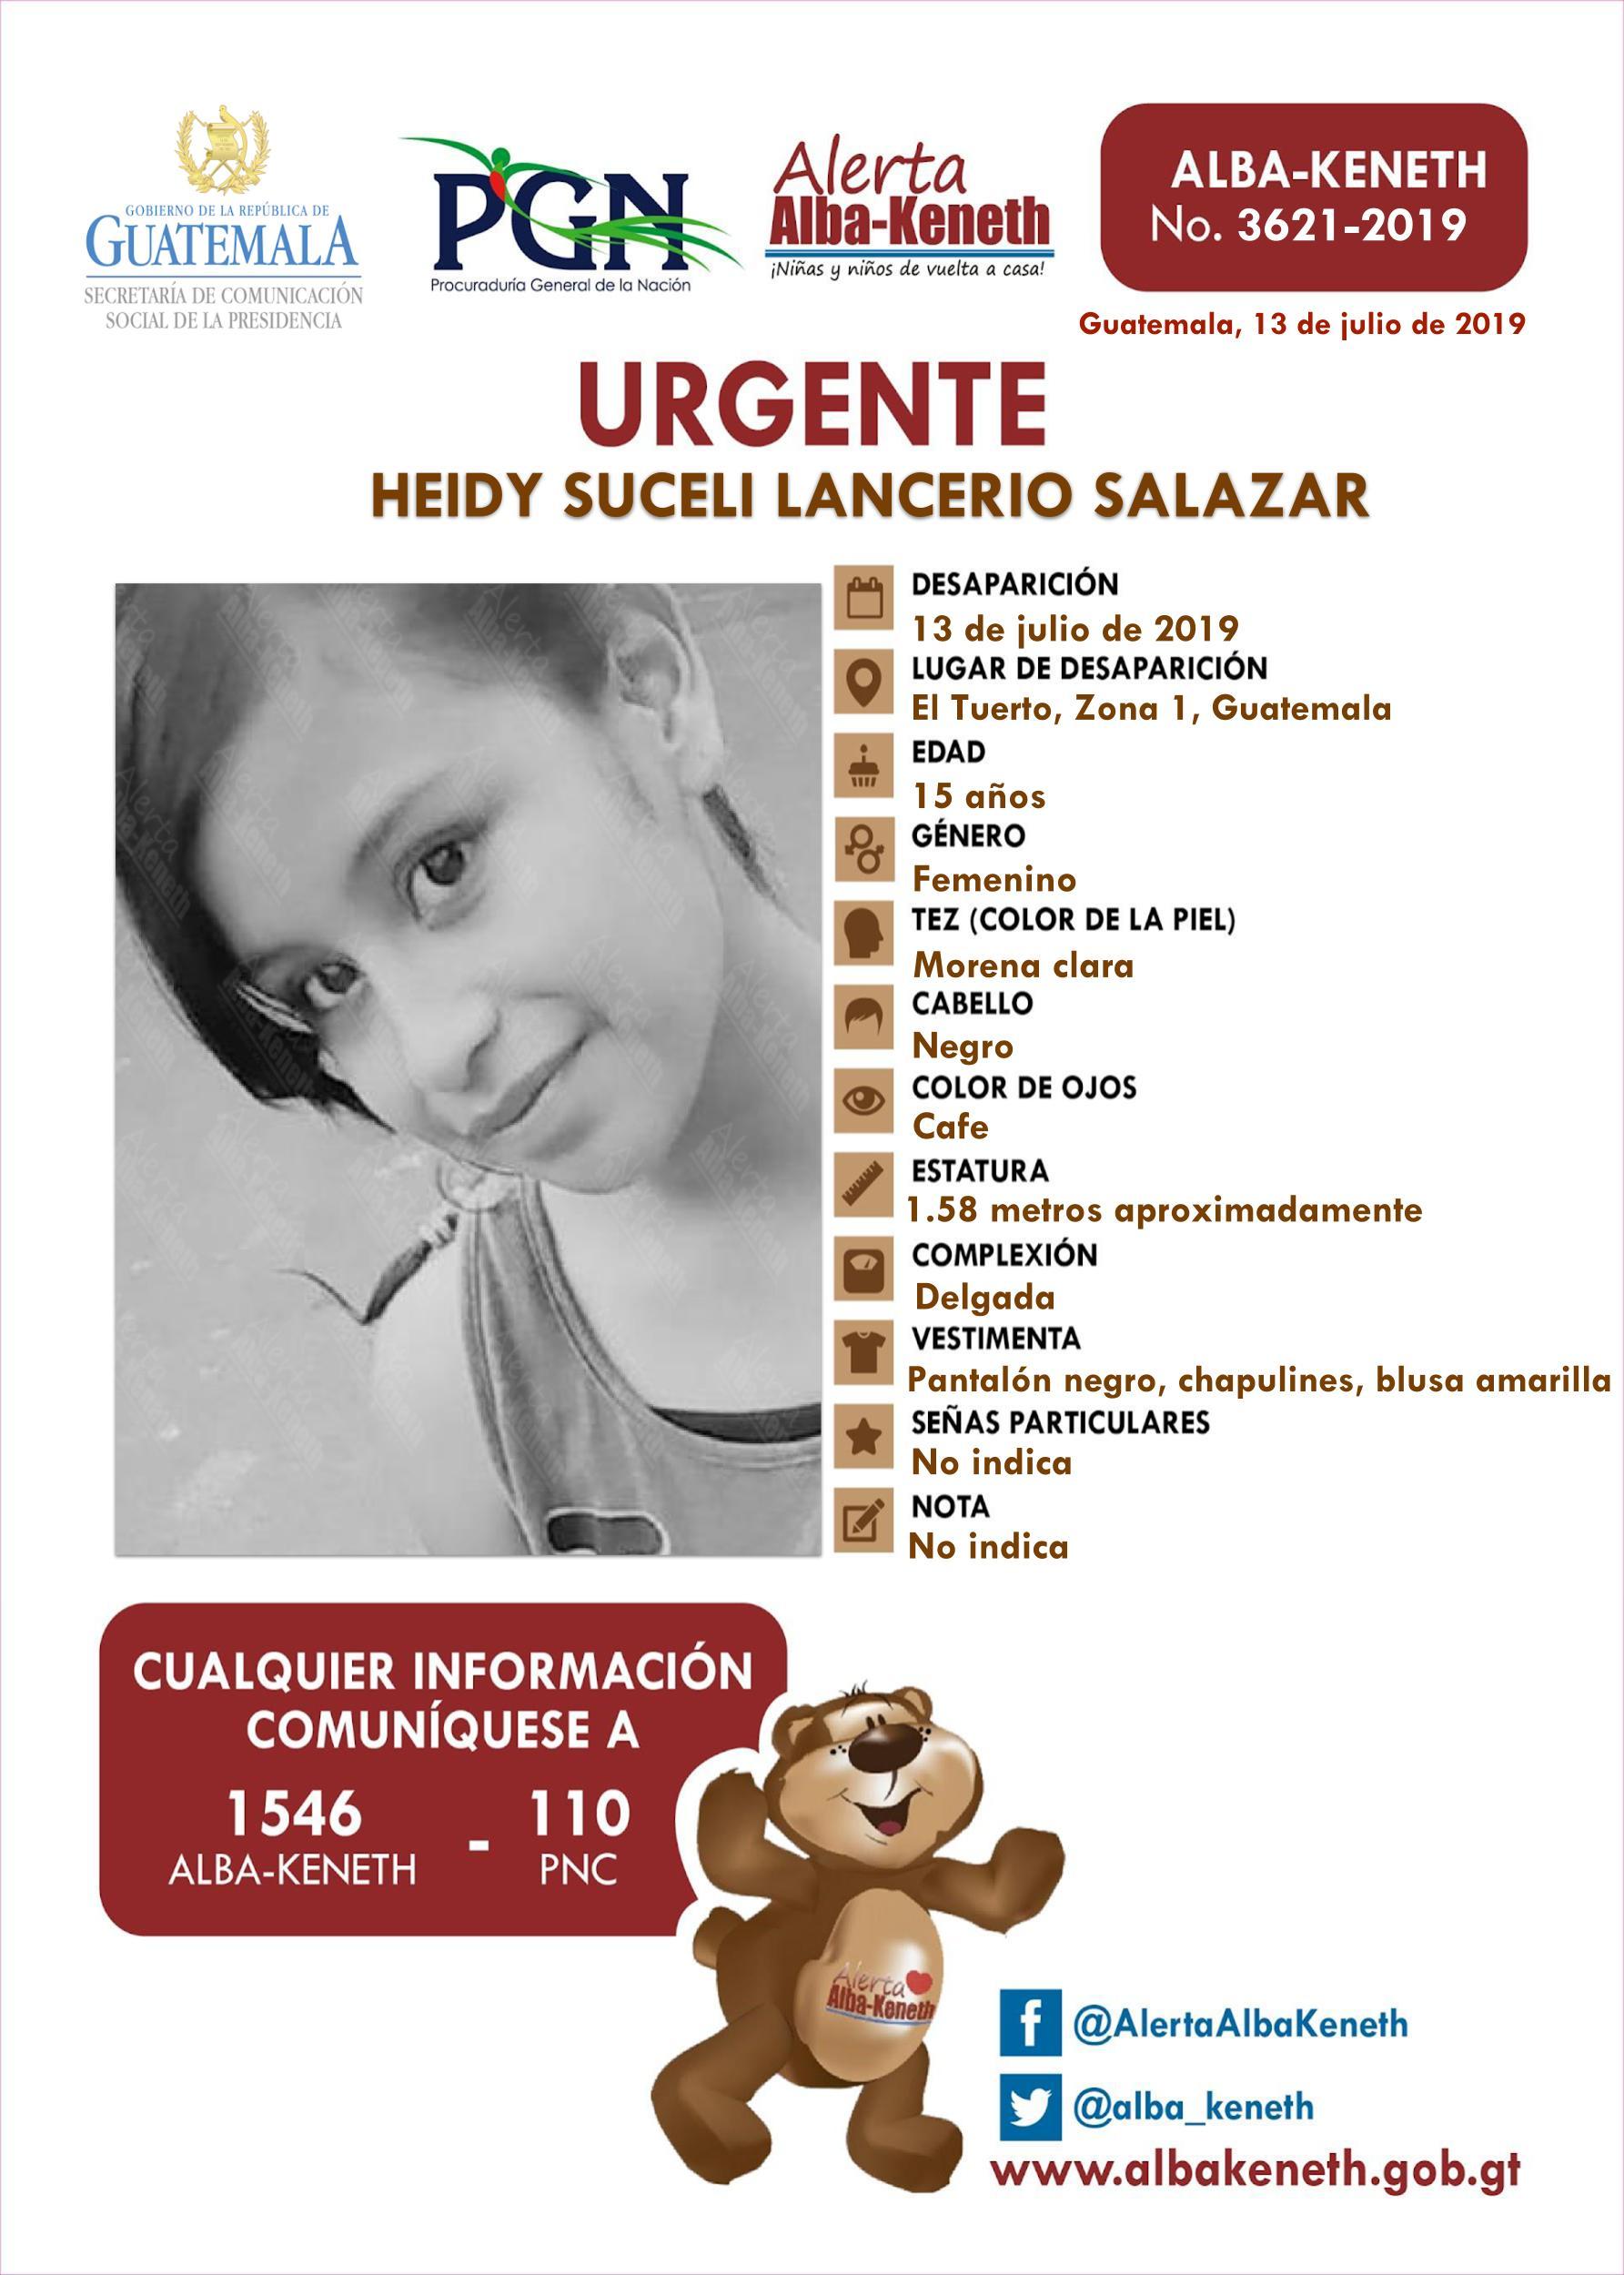 Heidy Suceli Lancerio Salazar